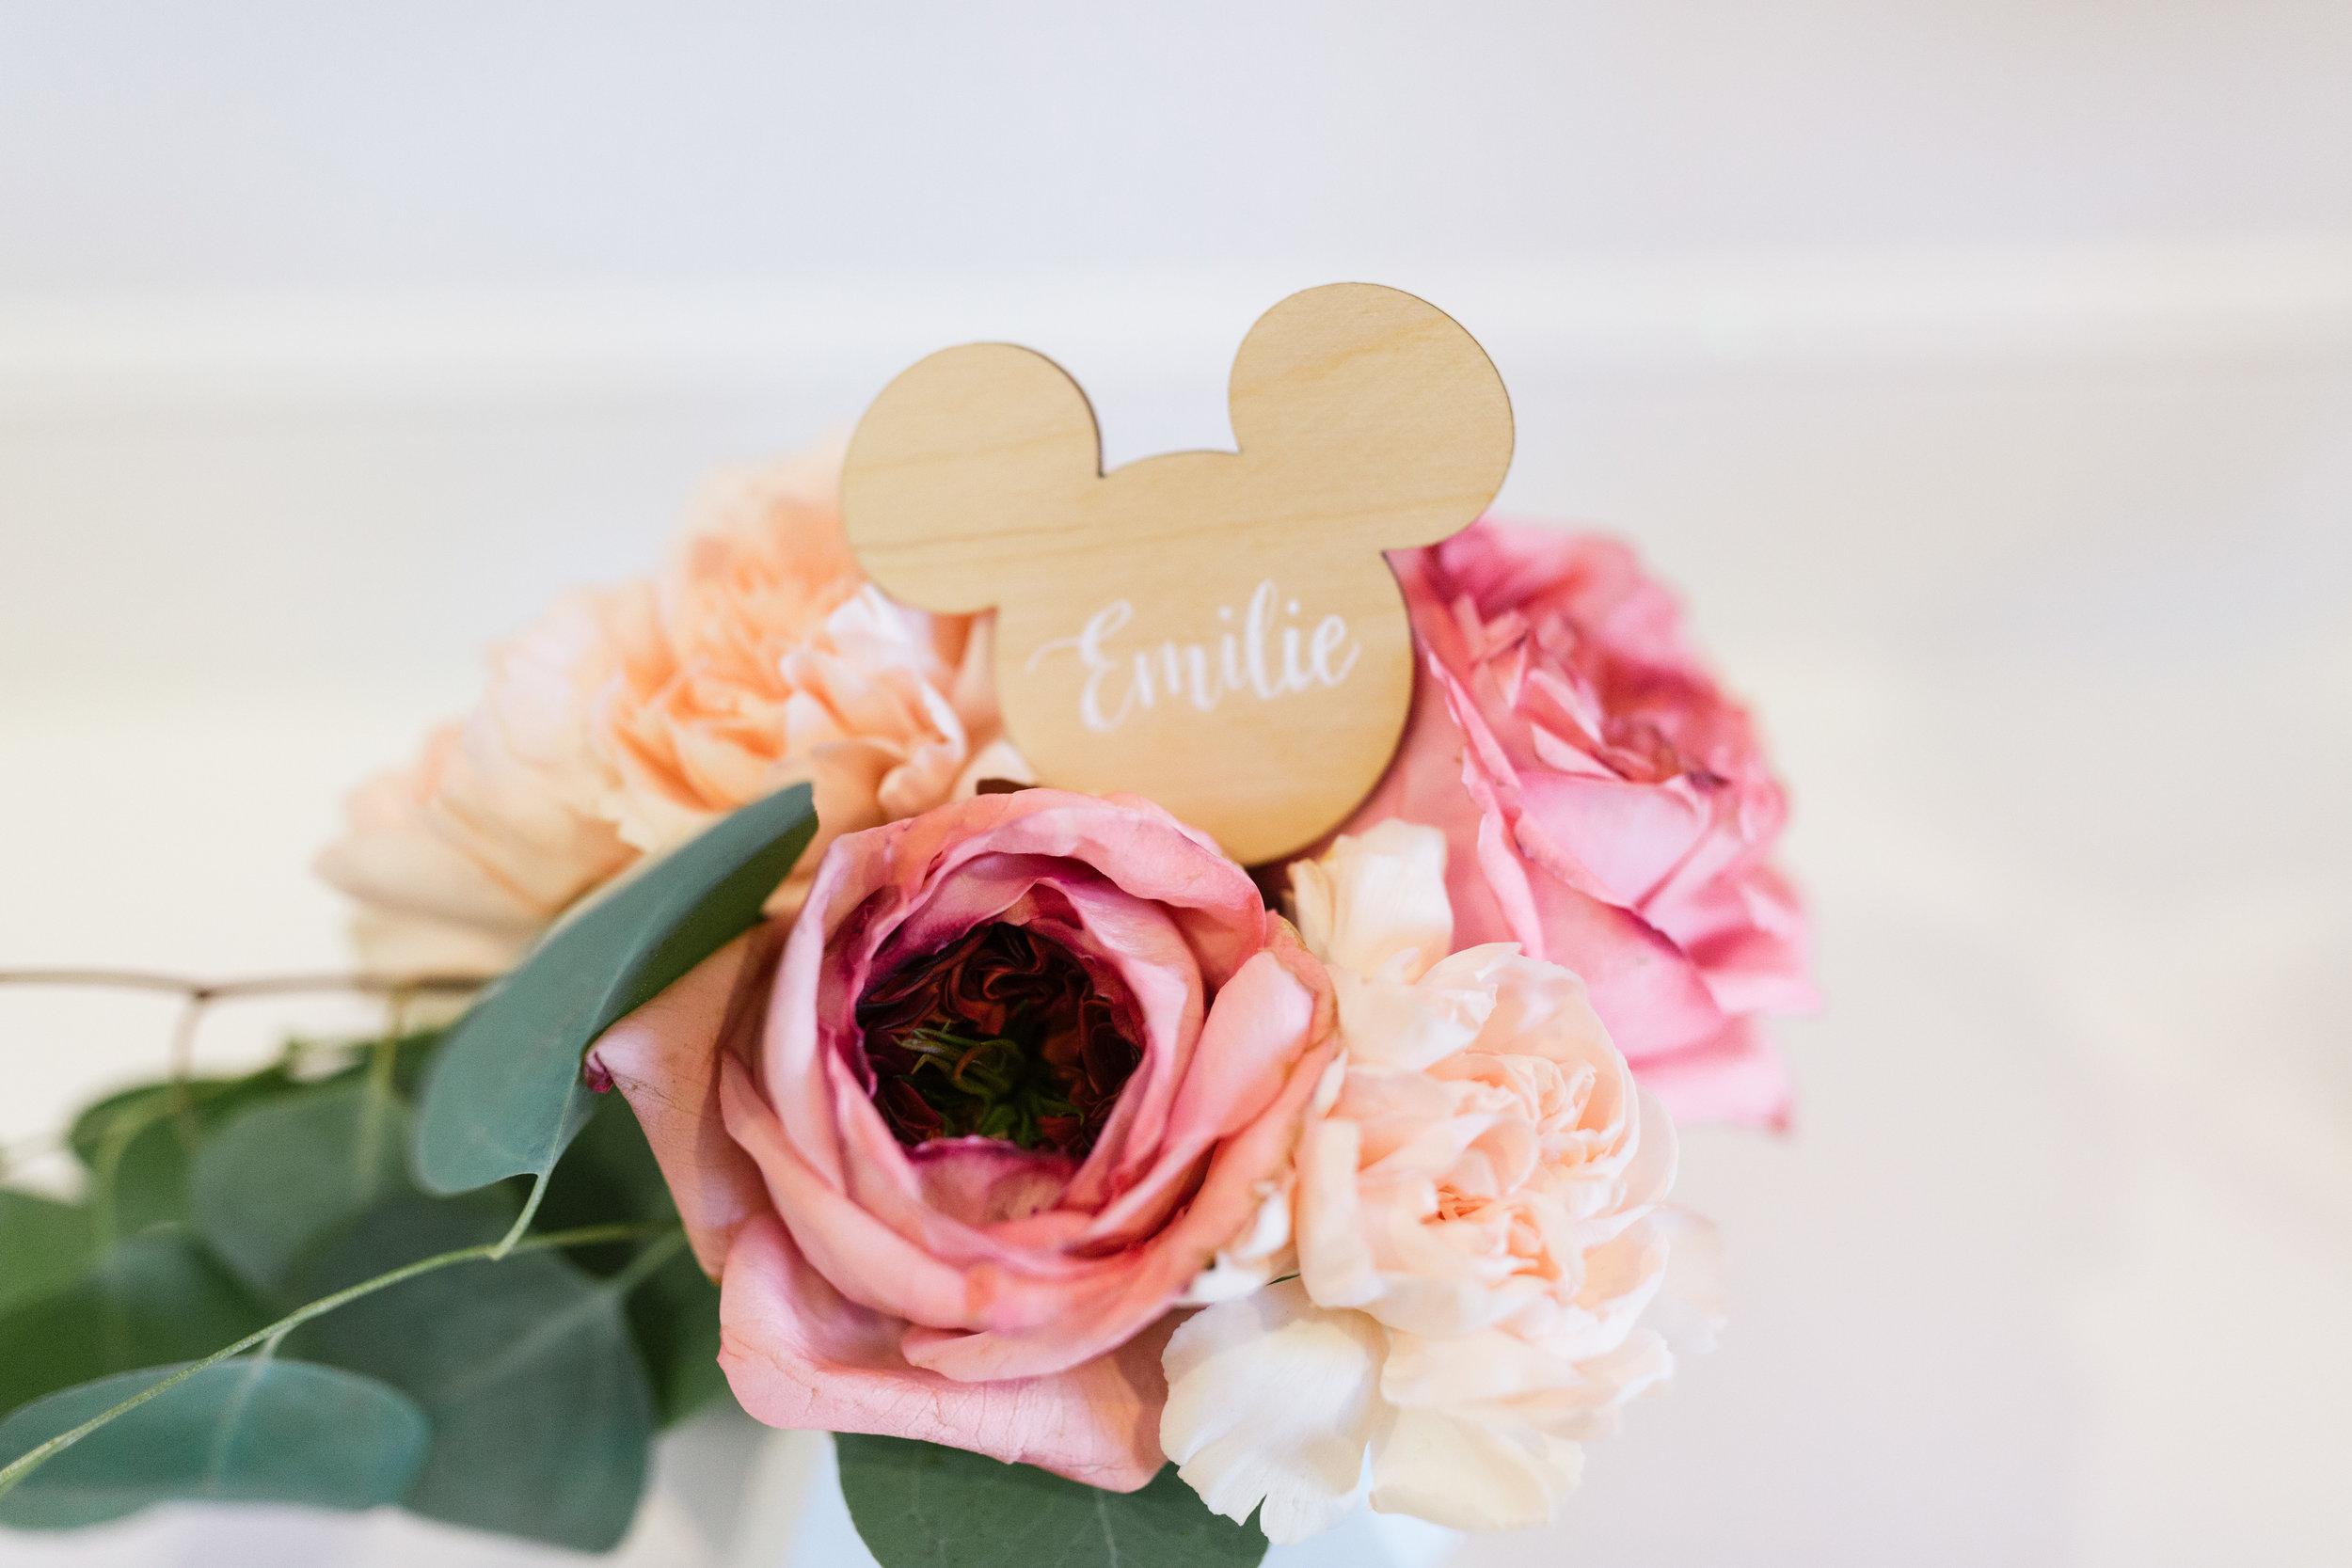 EmilieDo_DisneyBirthday-192.jpg